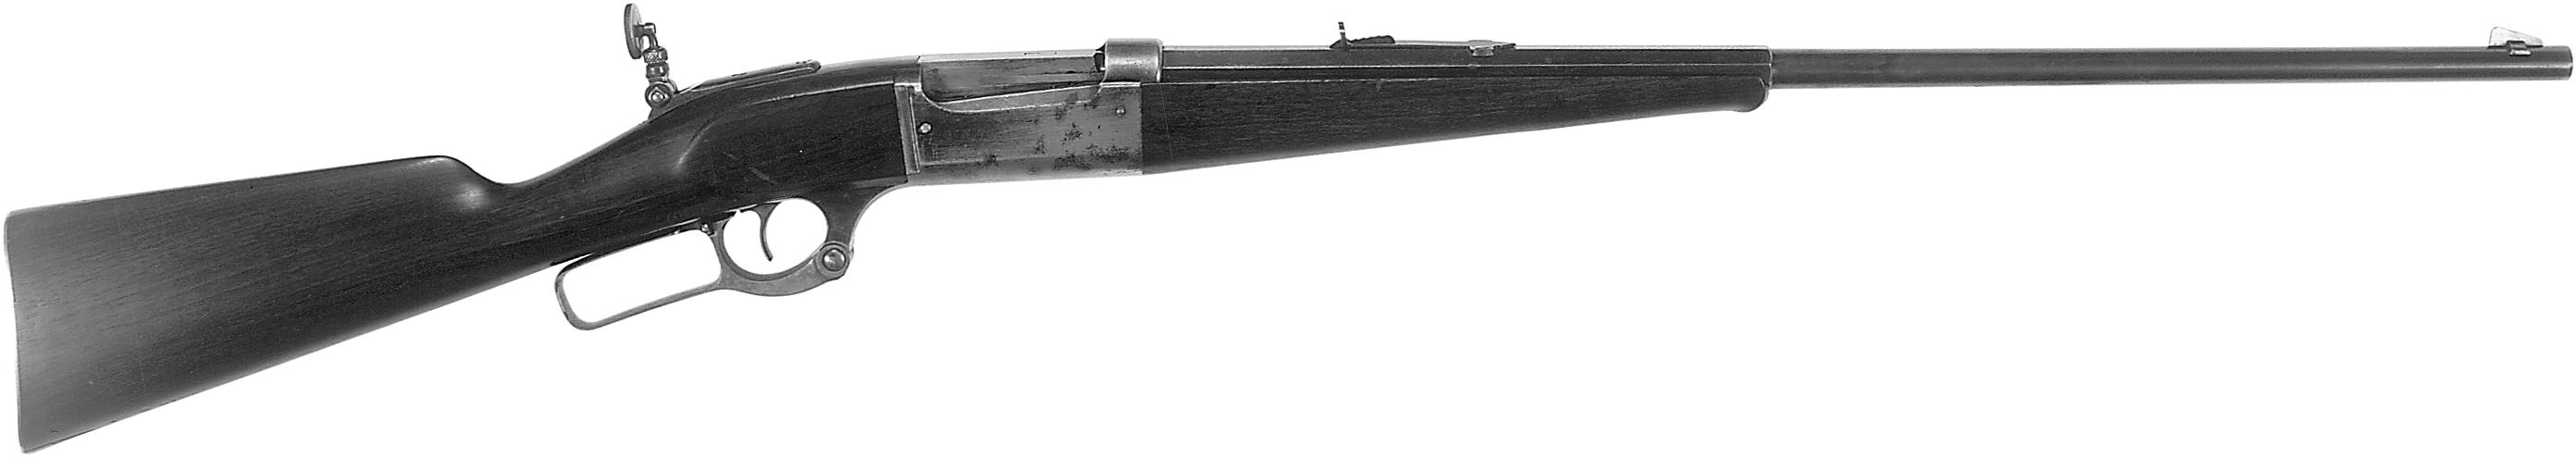 Model 1899-C 26